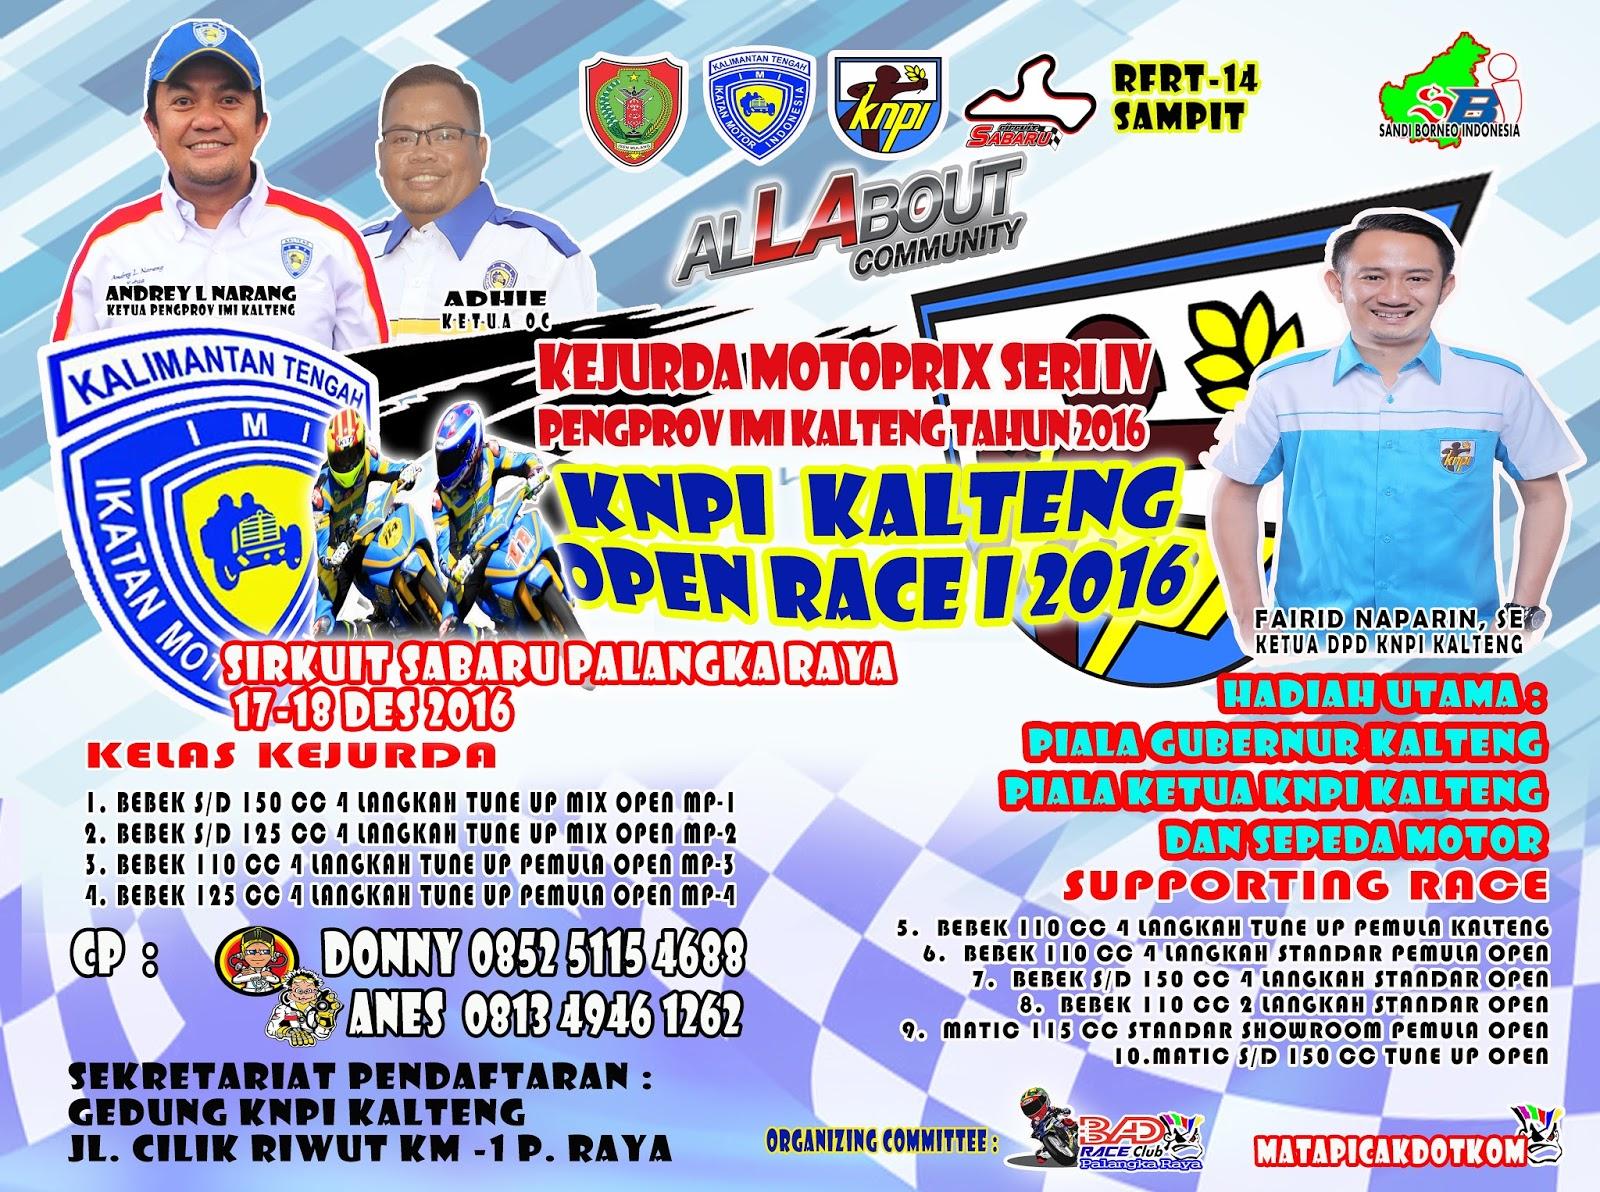 Kejurda Motoprix Seri IV Pemprov IMI Kalteng dan KNPI Kalteng Open Race I Tahun 2016